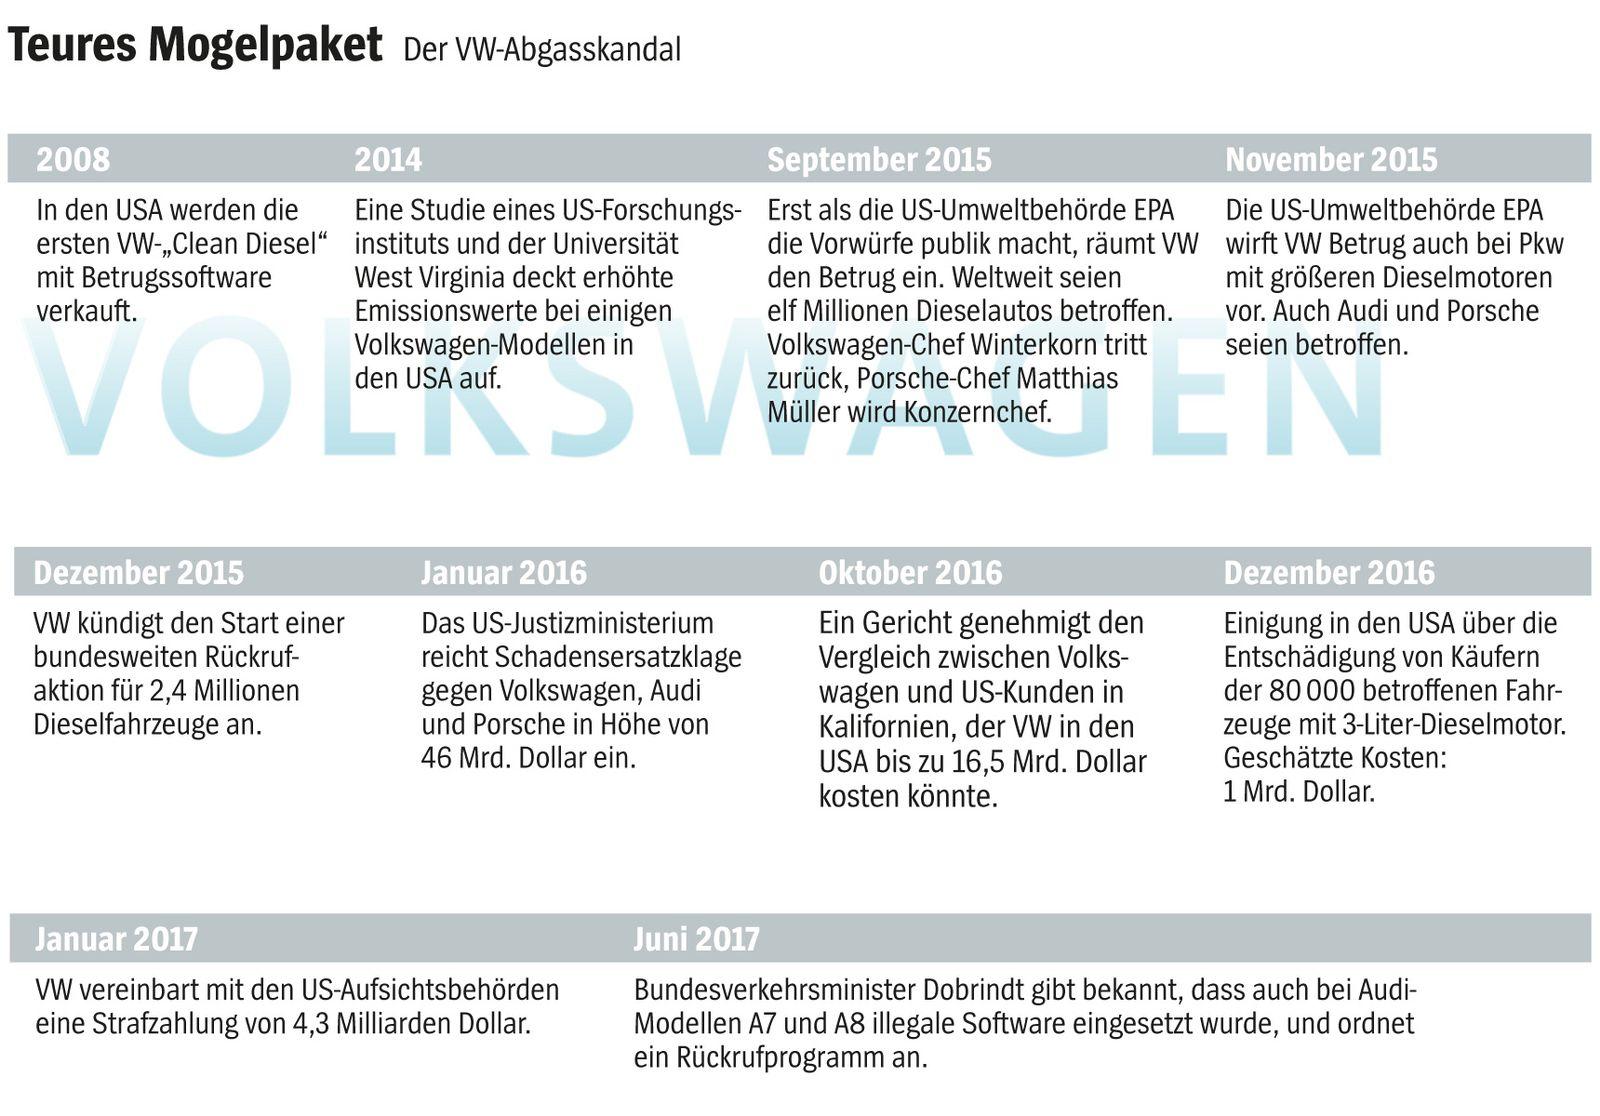 SP 24/2017, S.56 Grafik Porsche Dieselskandal / VW.Skandal